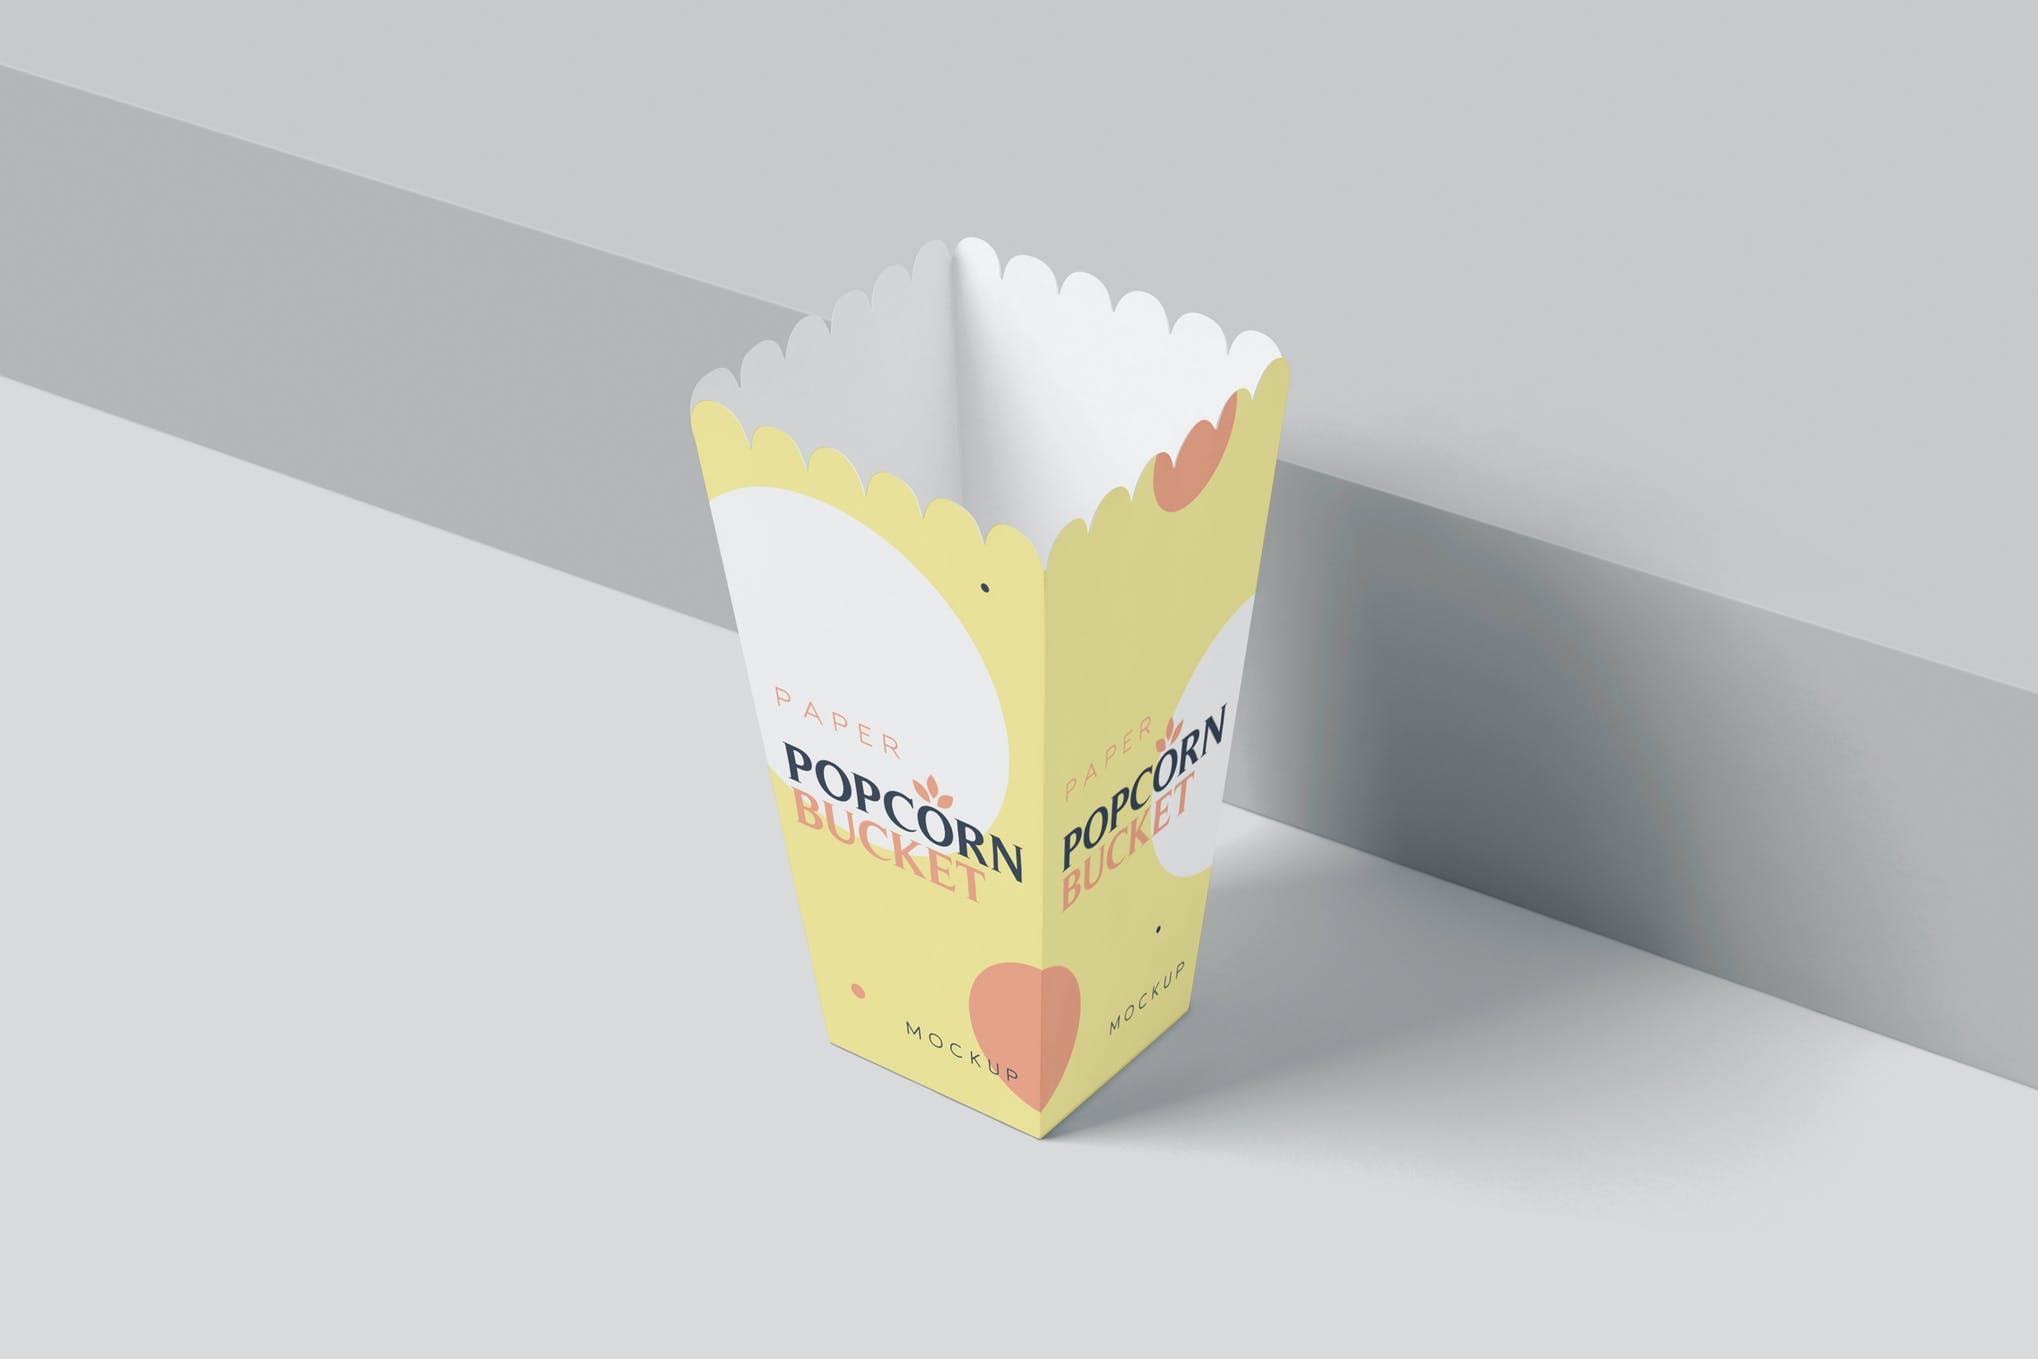 popcorn-bucket-mockups